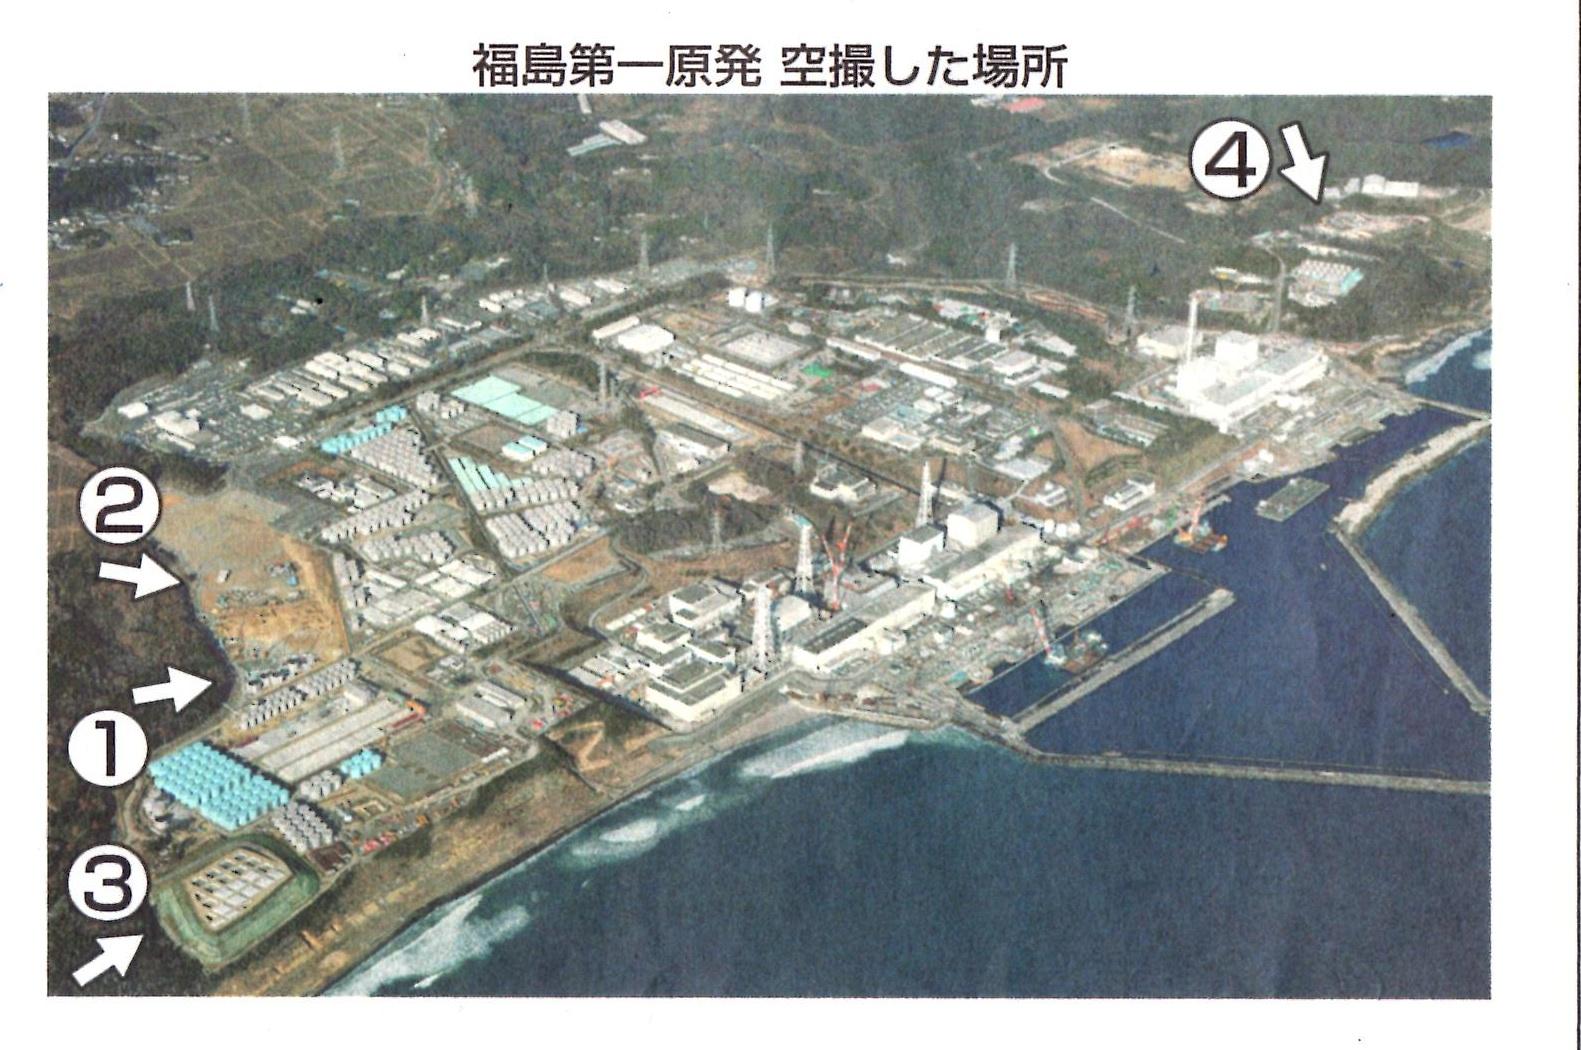 F1 震災1000日漏れ続ける汚染水 上空レポ 東京新聞_b0242956_23194336.jpg